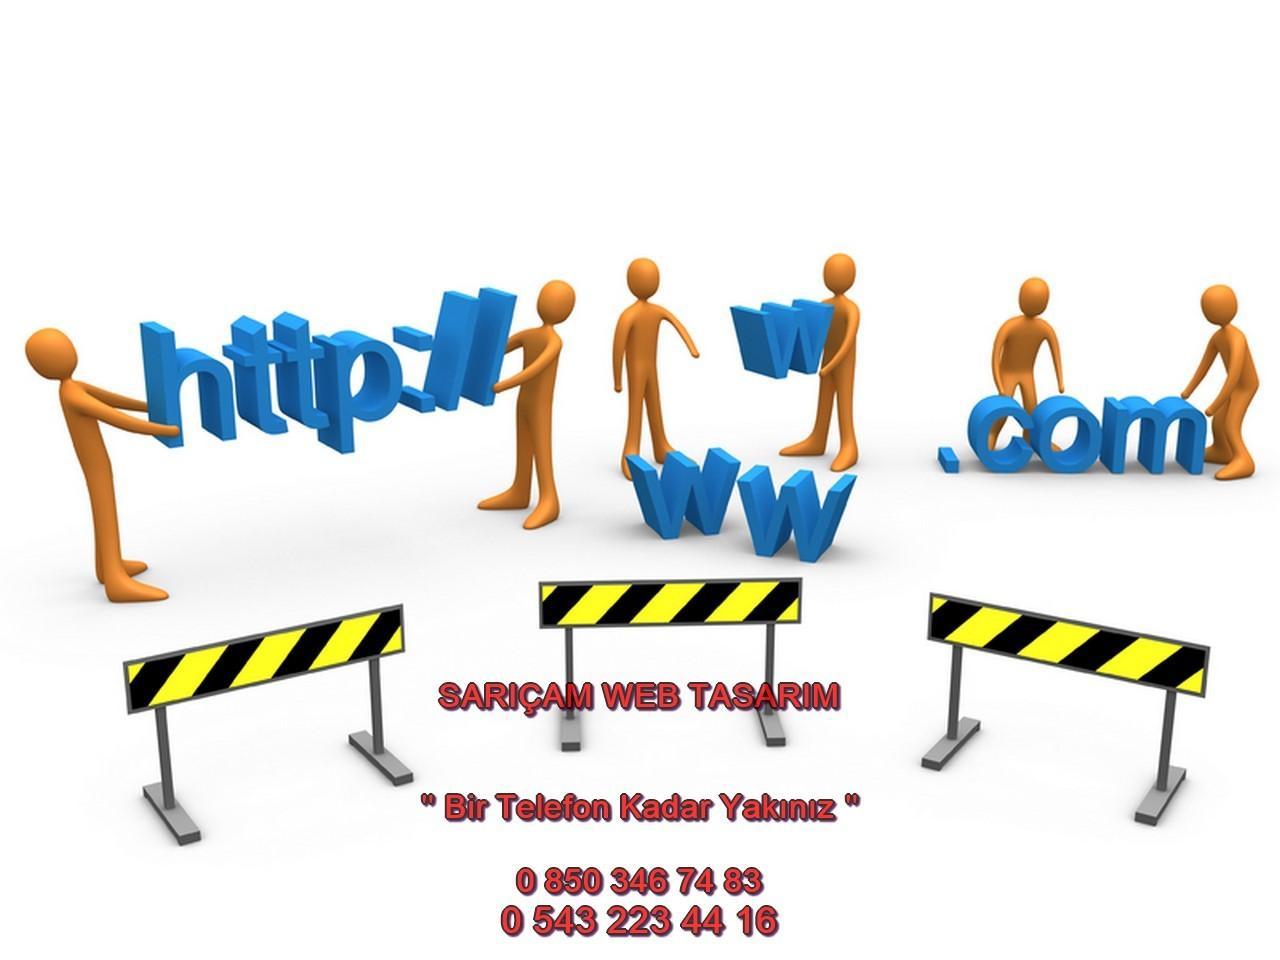 Sarıçam Web Tasarım